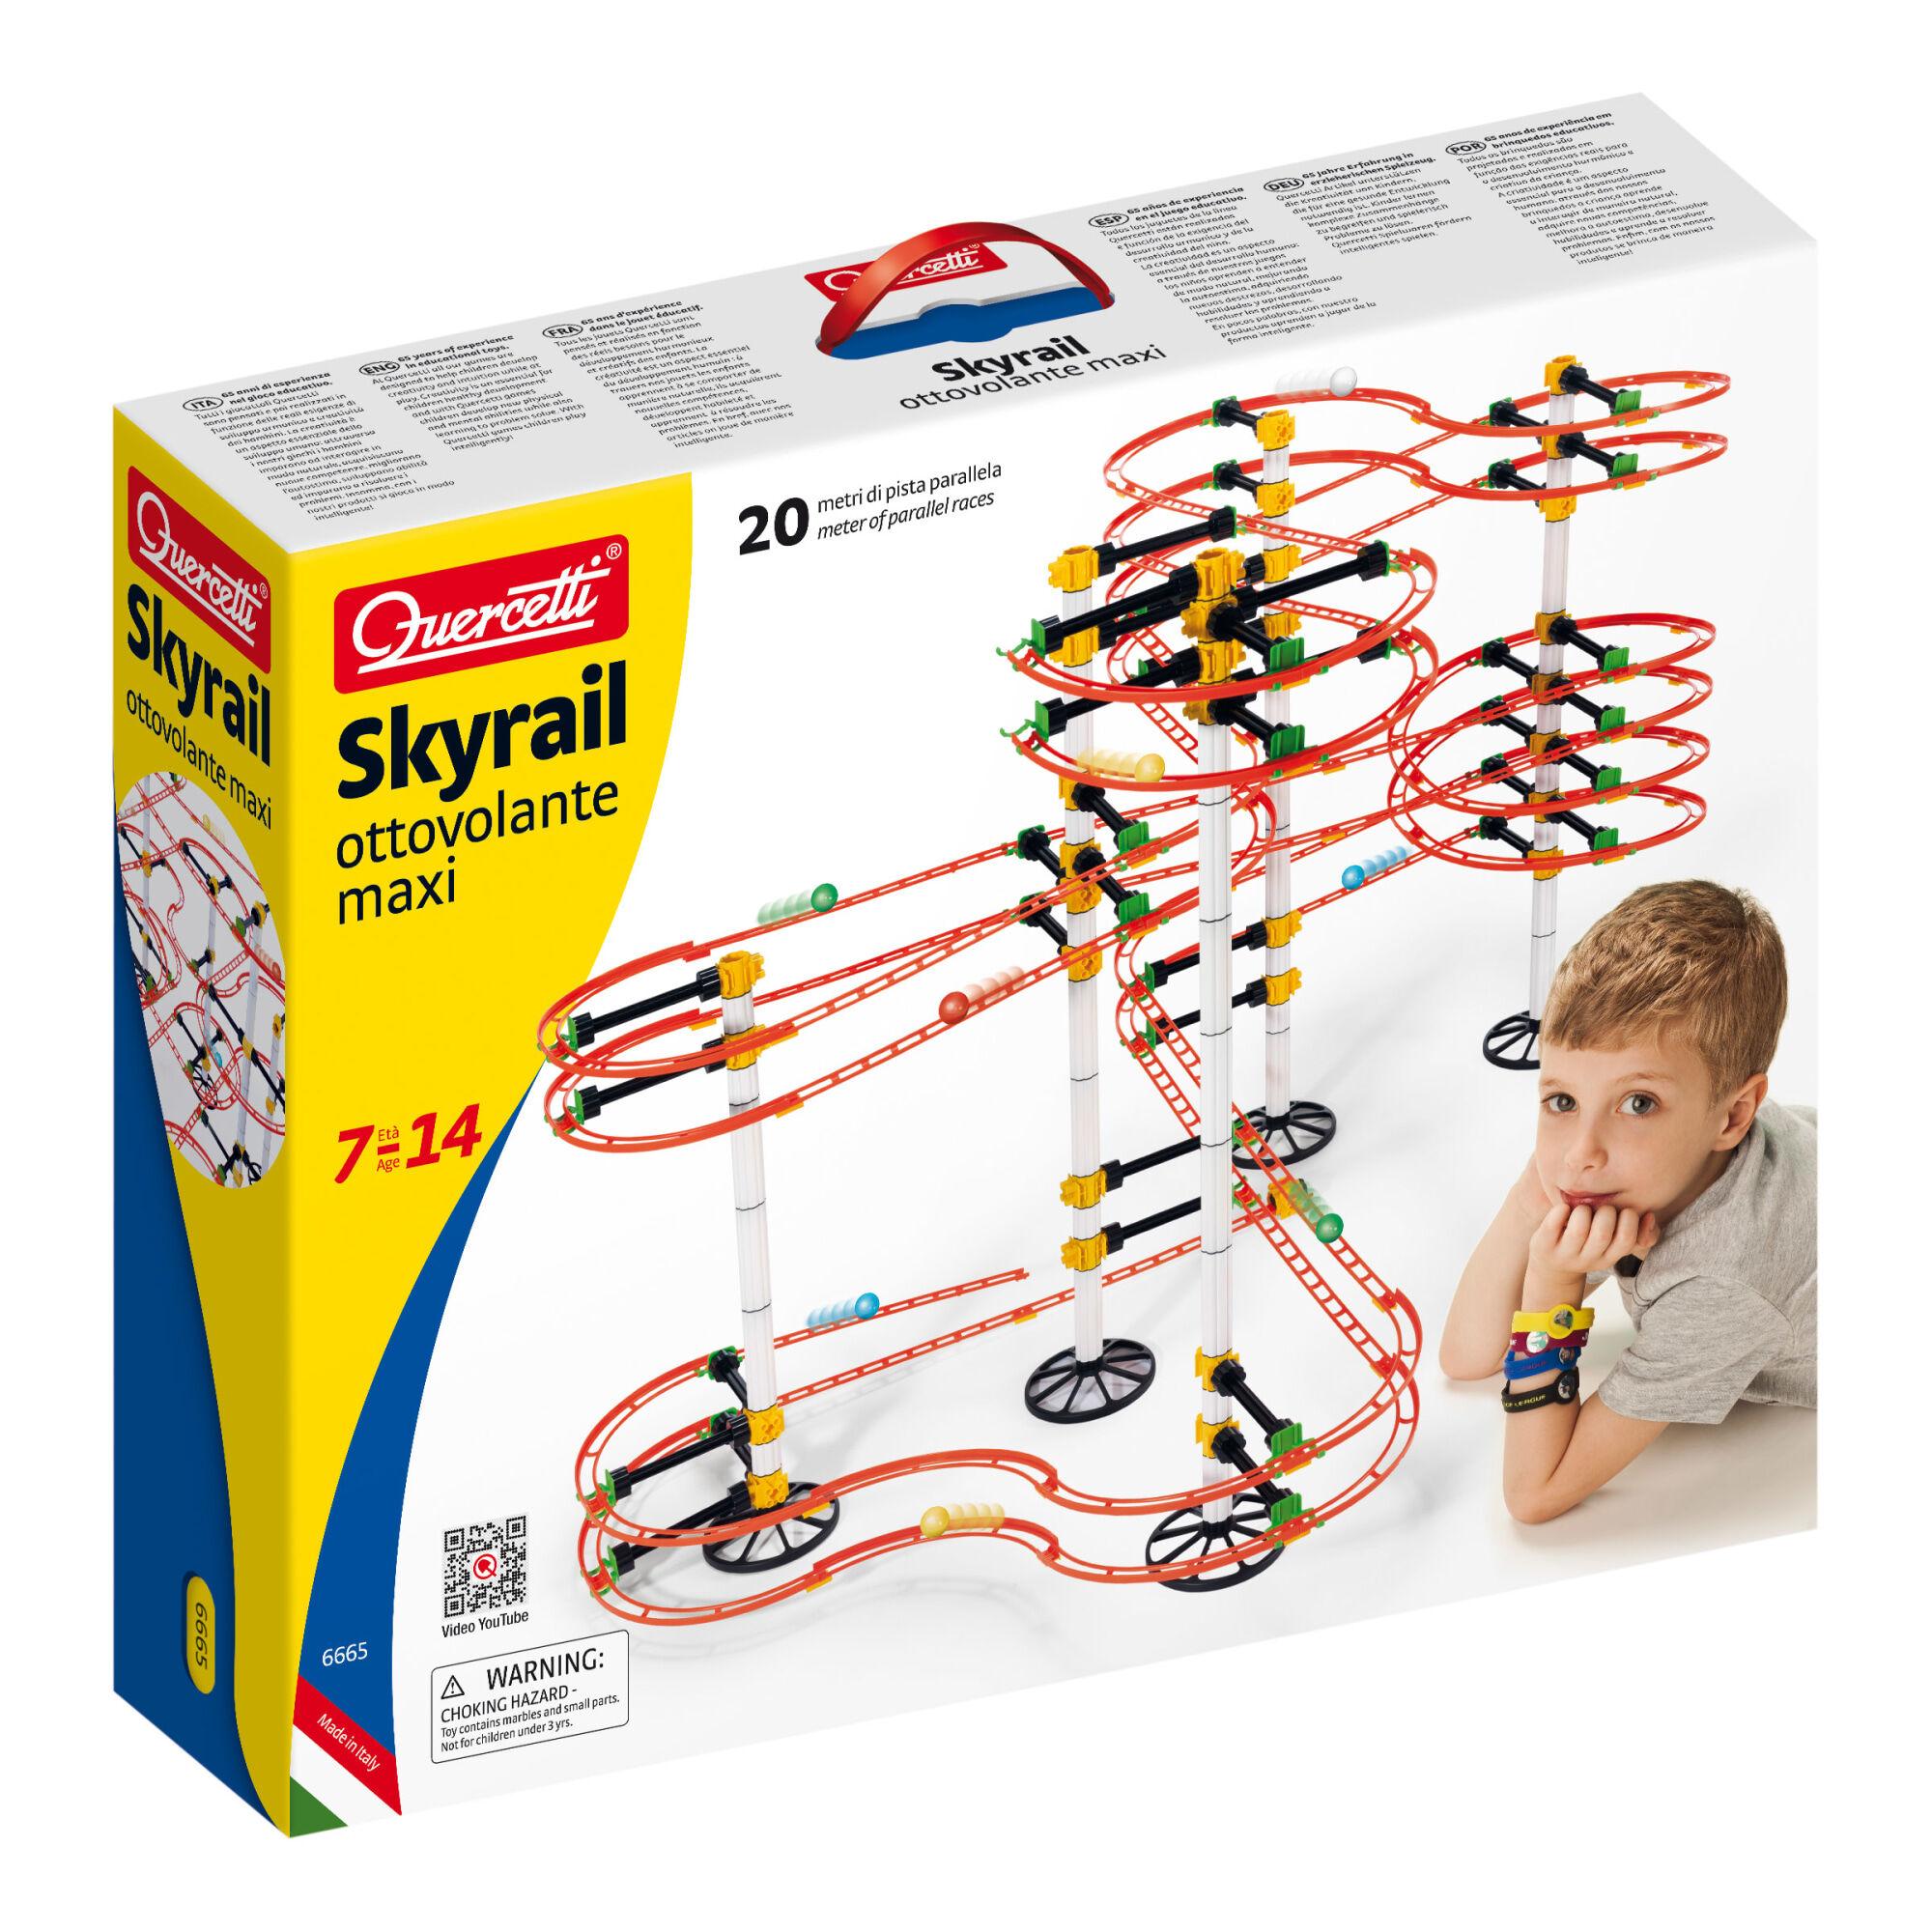 Quercetti Skyrail Ottovolante maxi kuularata